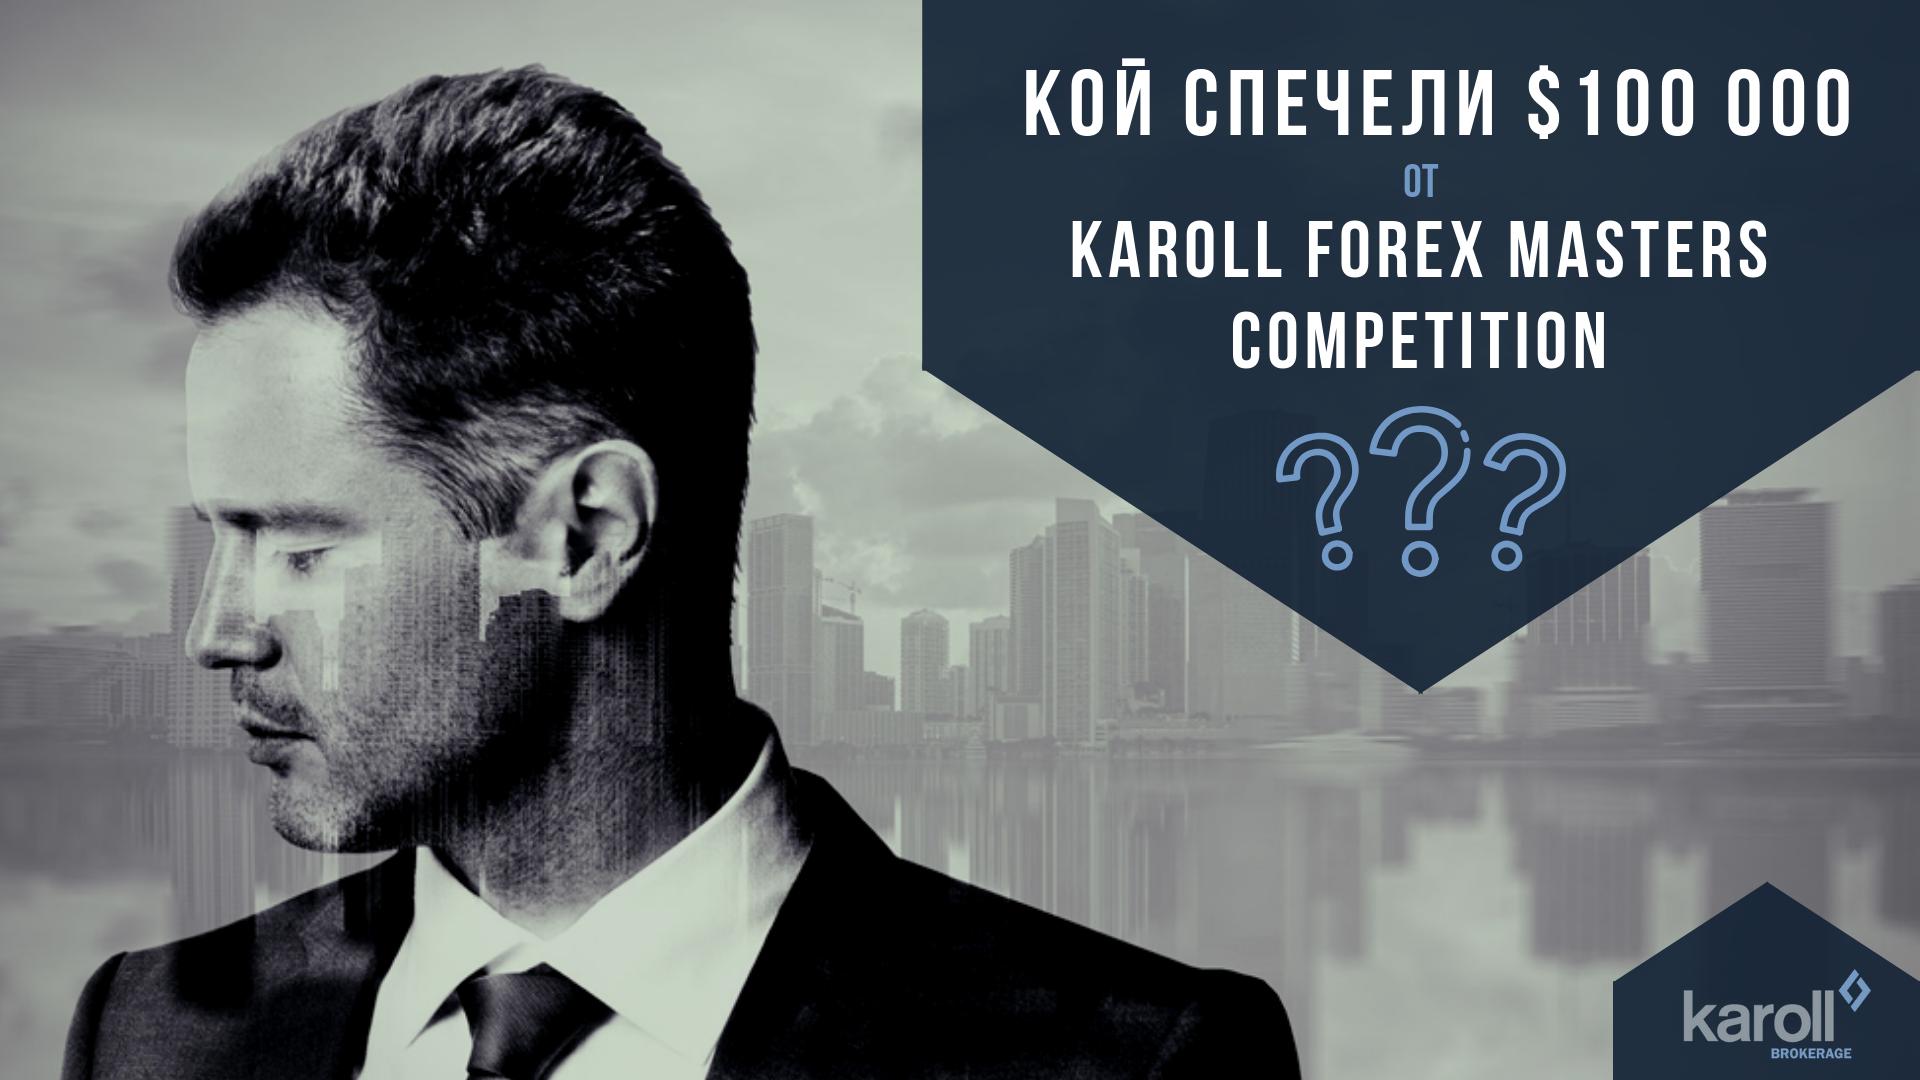 nagrazhdavane-karoll-forex-masters-competition